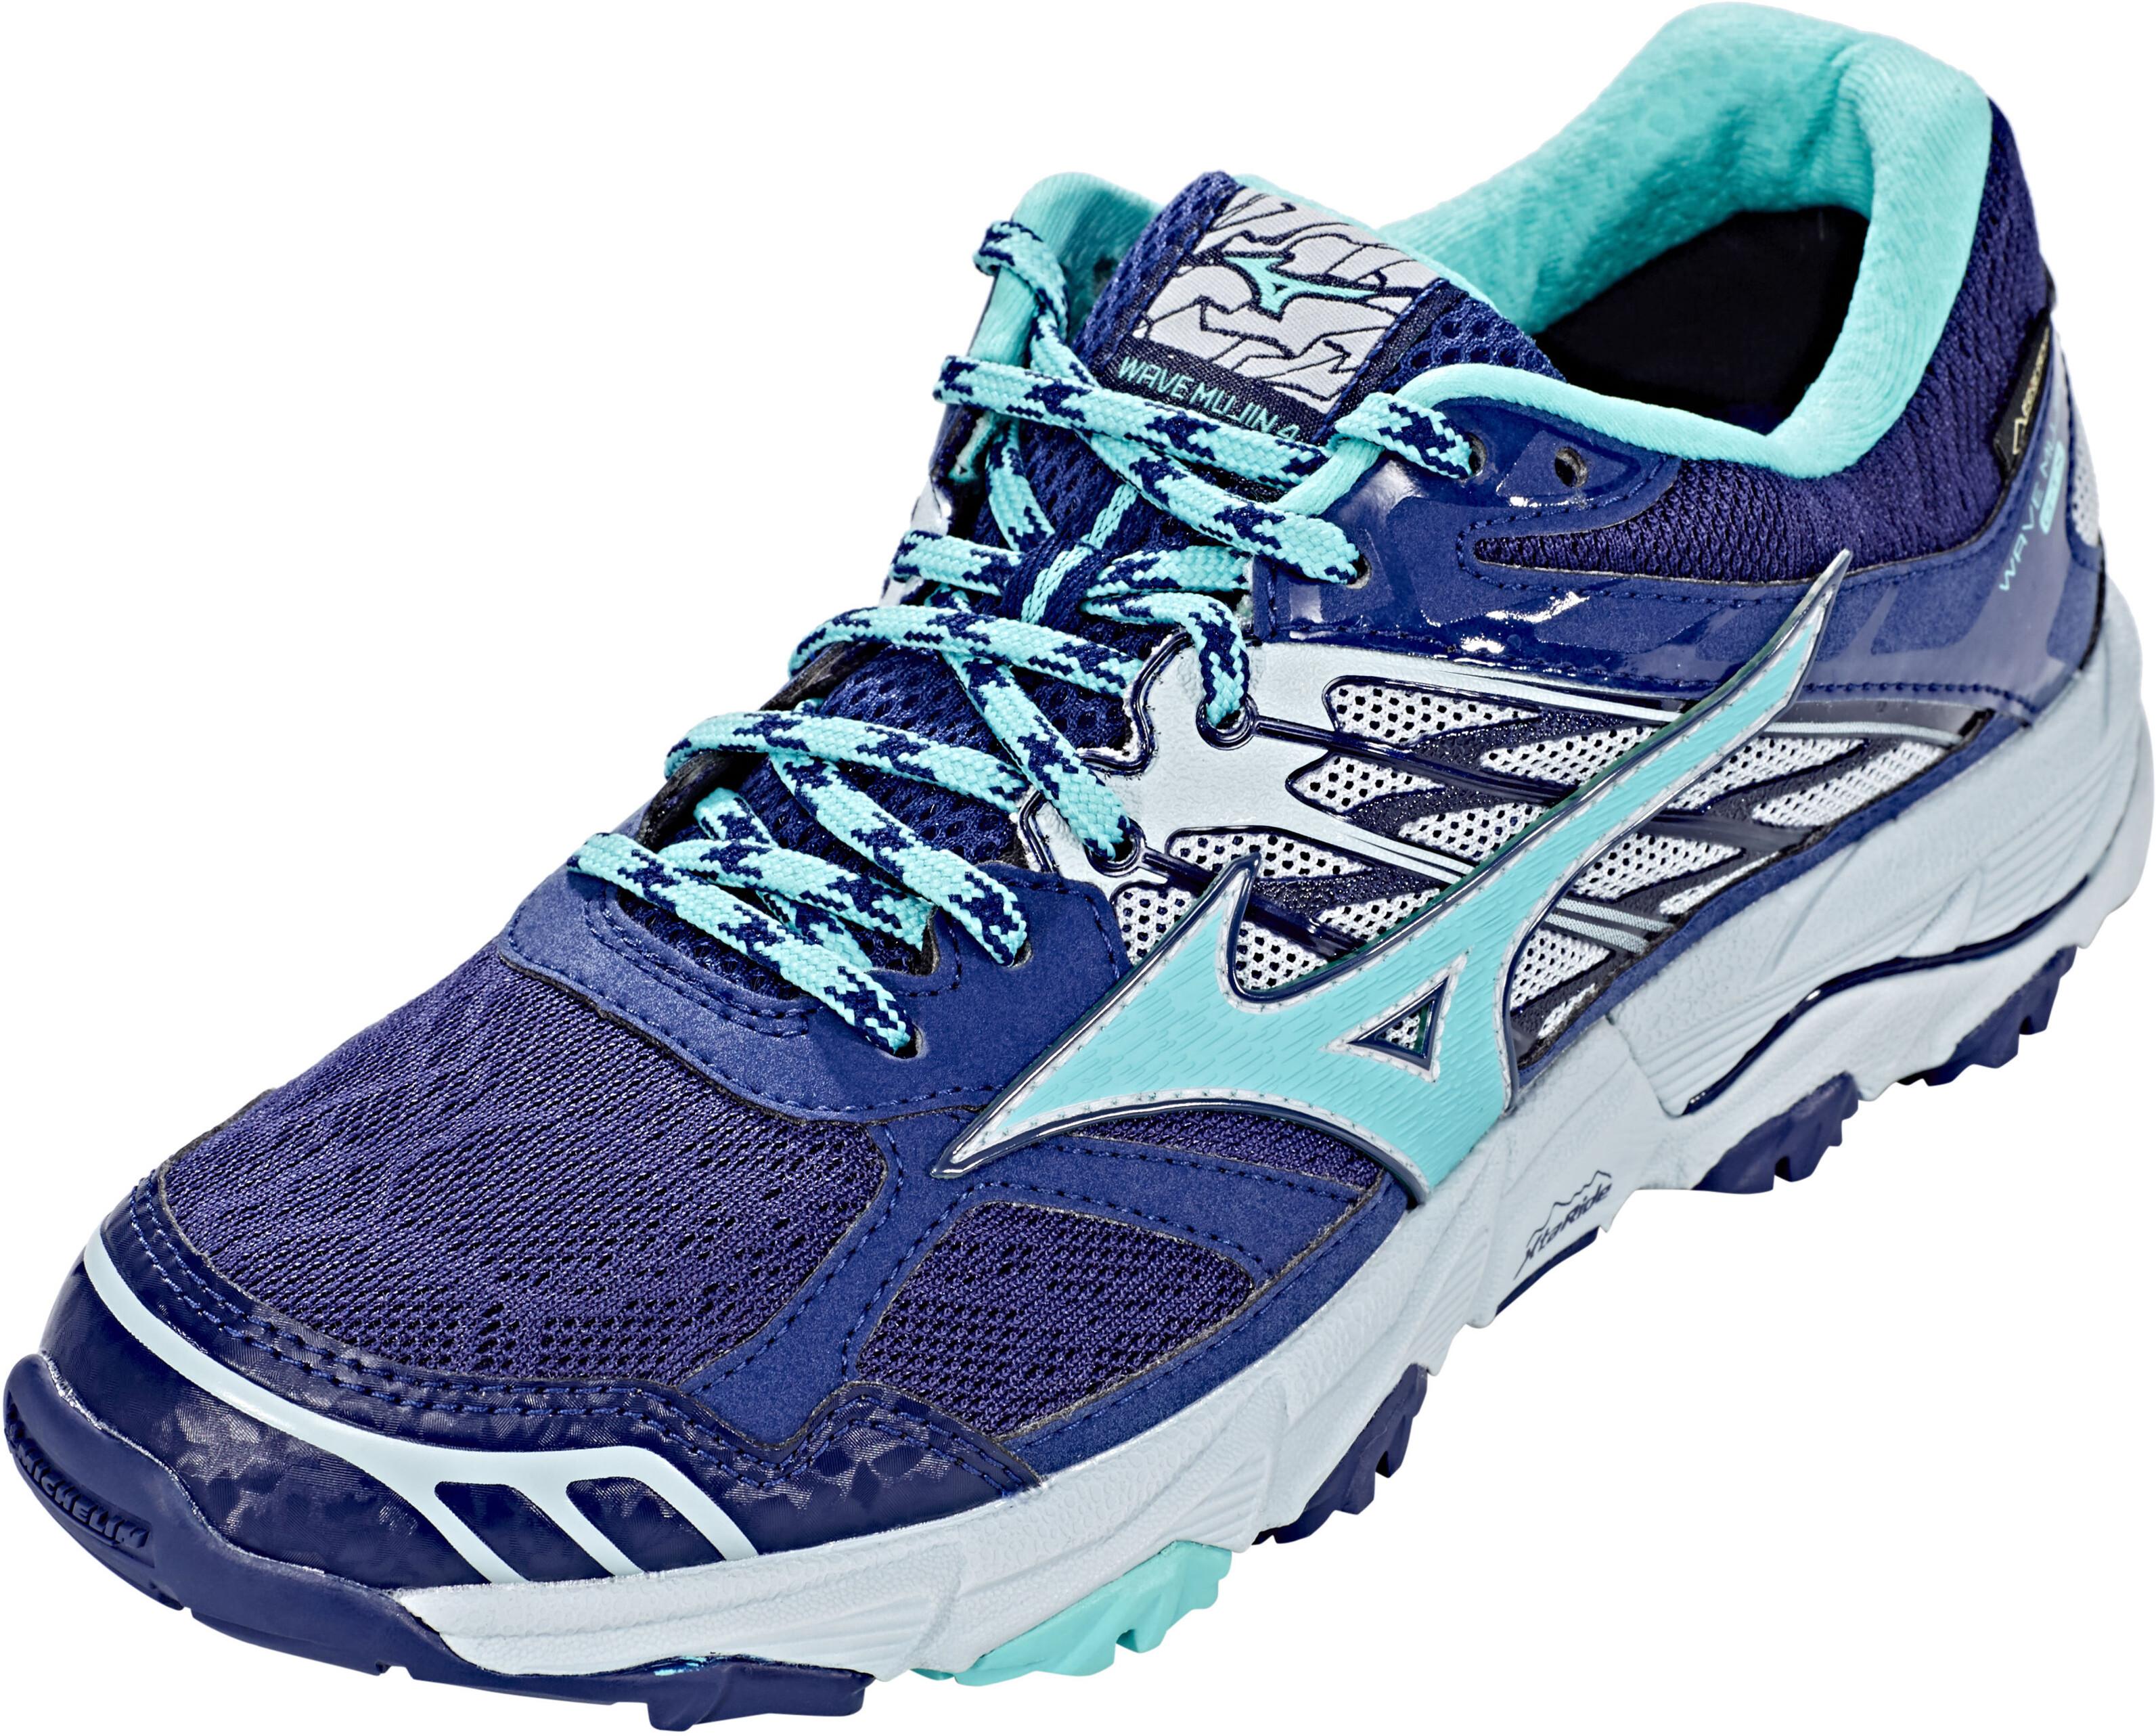 timeless design ae794 f7574 Mizuno Wave Mujin 4 G-TX - Chaussures running Femme - bleu turquoise